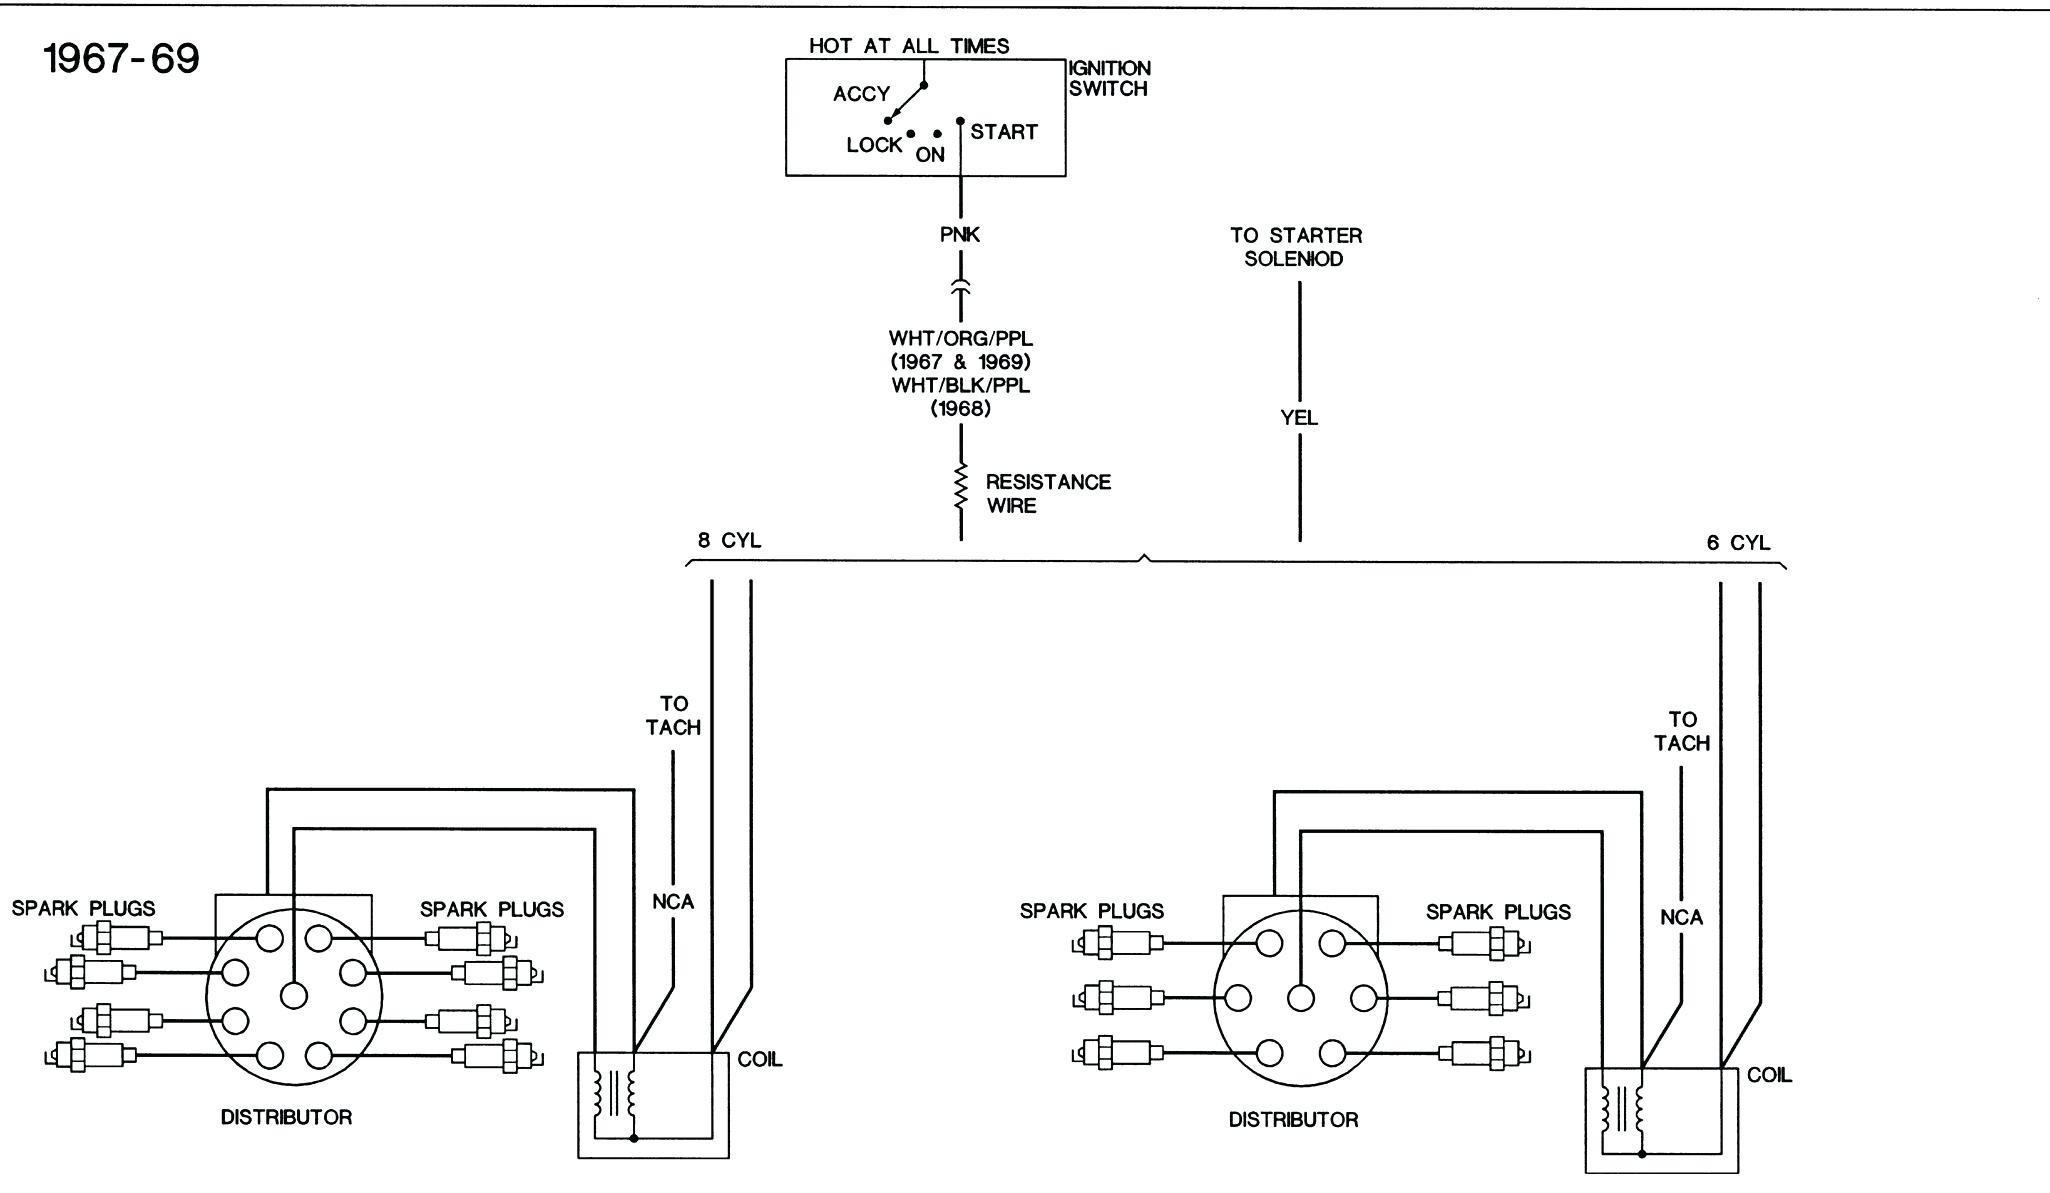 FZ_0769] Basic Wiring Diagram Fuel Gauge Download Diagram | Sport Comp Fuel Gauge Wiring Diagram |  | Oxyl Osuri Bepta Mohammedshrine Librar Wiring 101